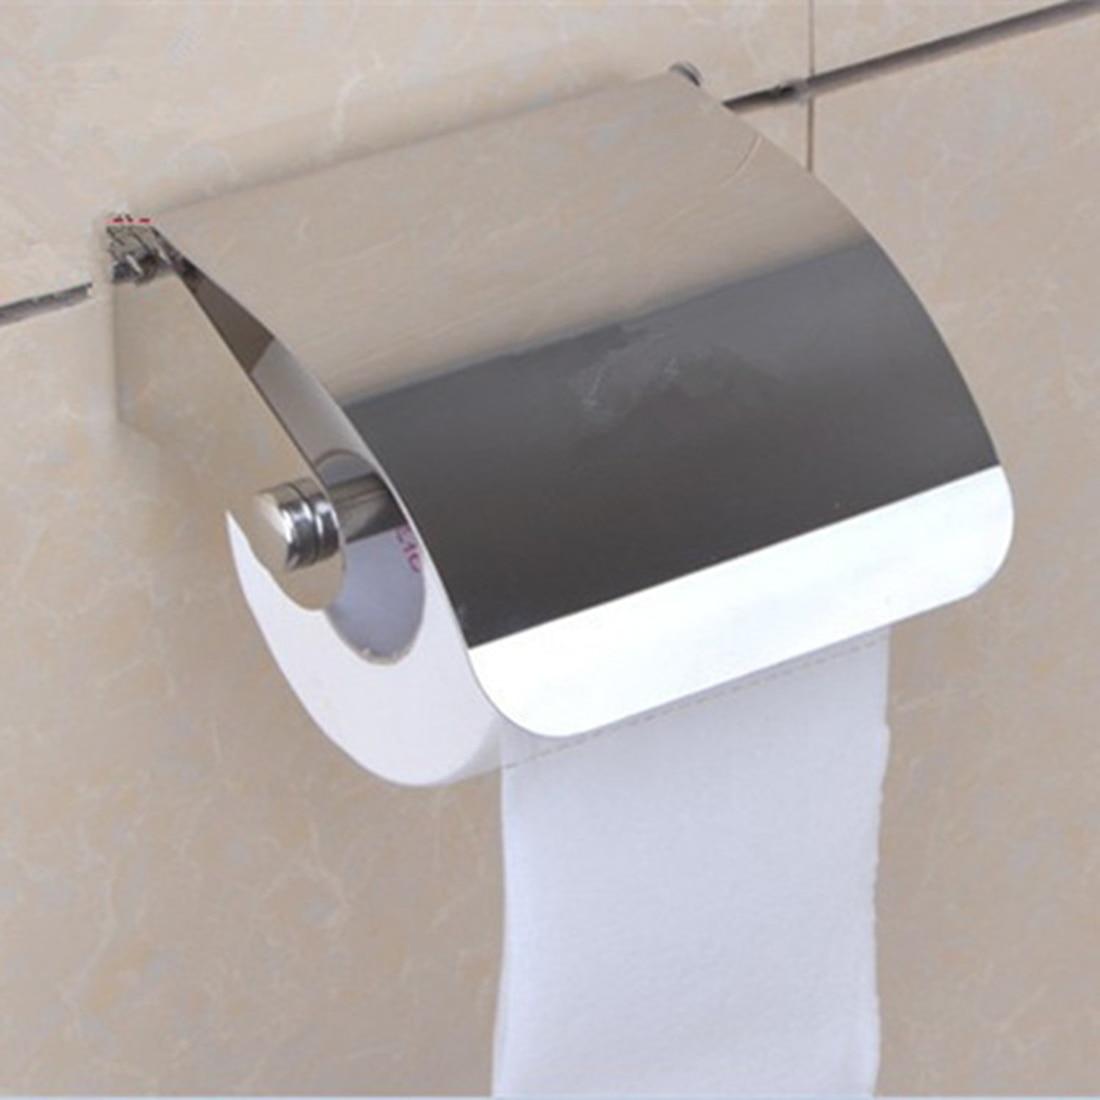 bathroom accessories stainless steel toilet paper roll holder creative bathroom wall mount rack. Black Bedroom Furniture Sets. Home Design Ideas